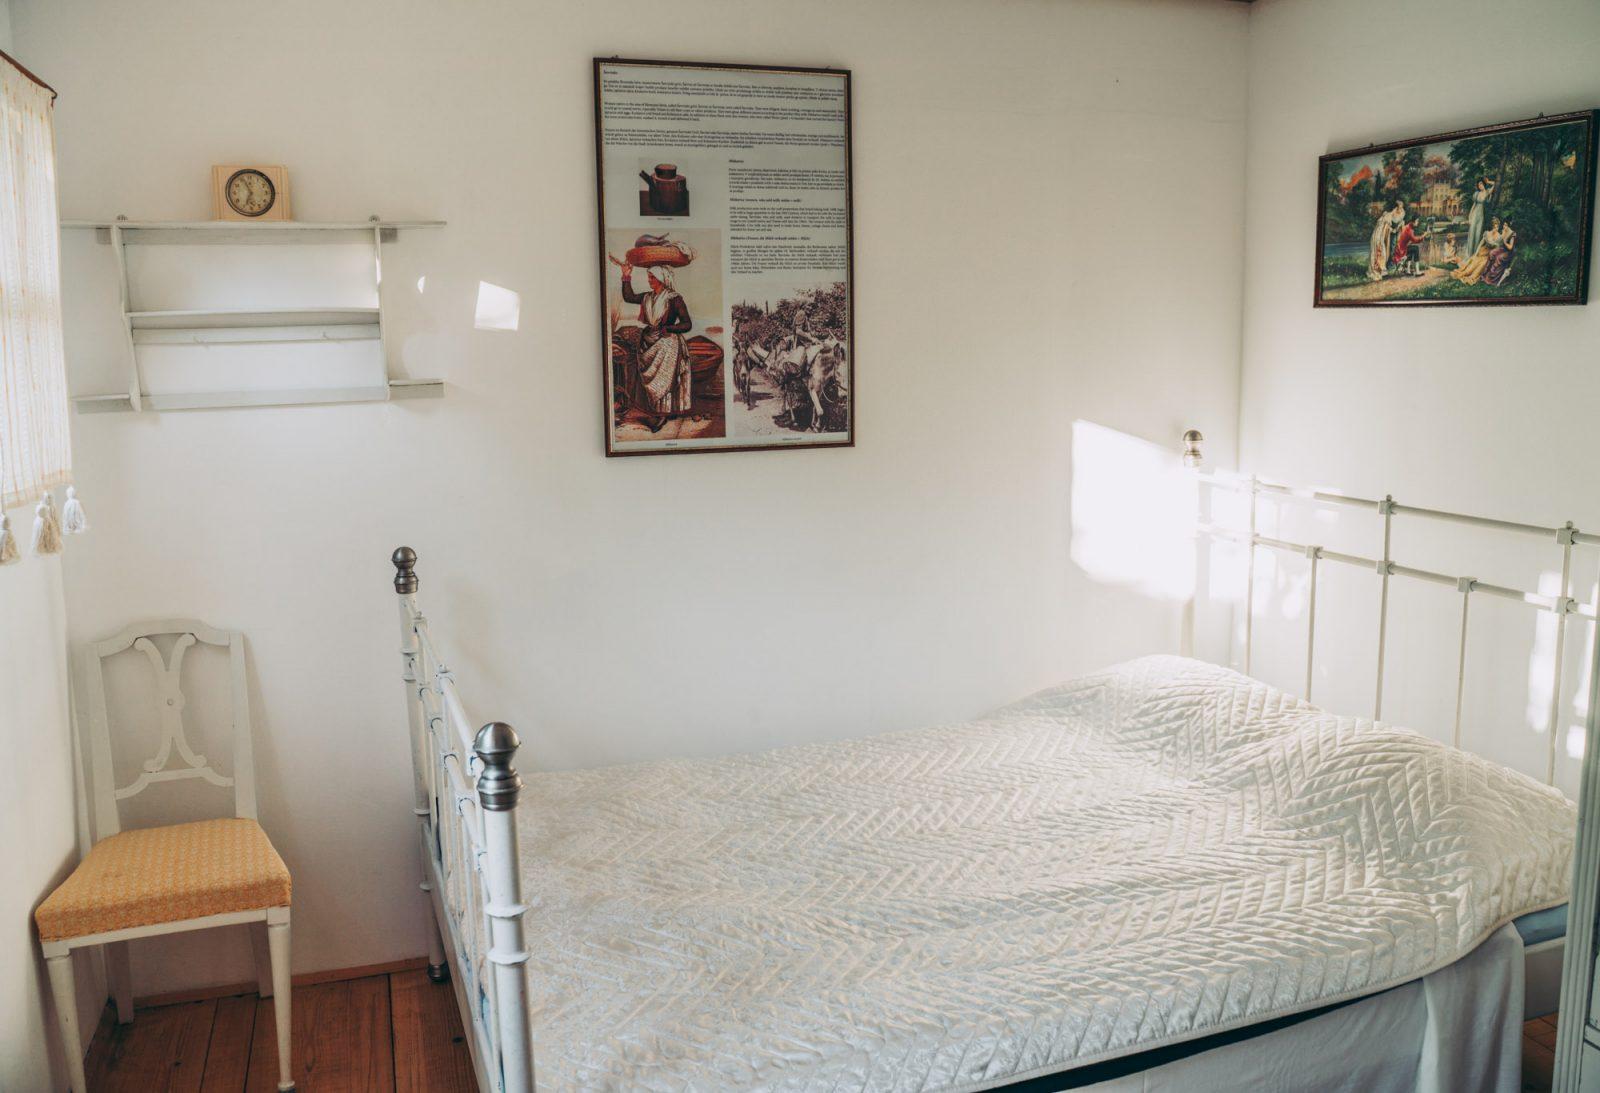 Milk Lady cabin at Hiške Slovenske Istre